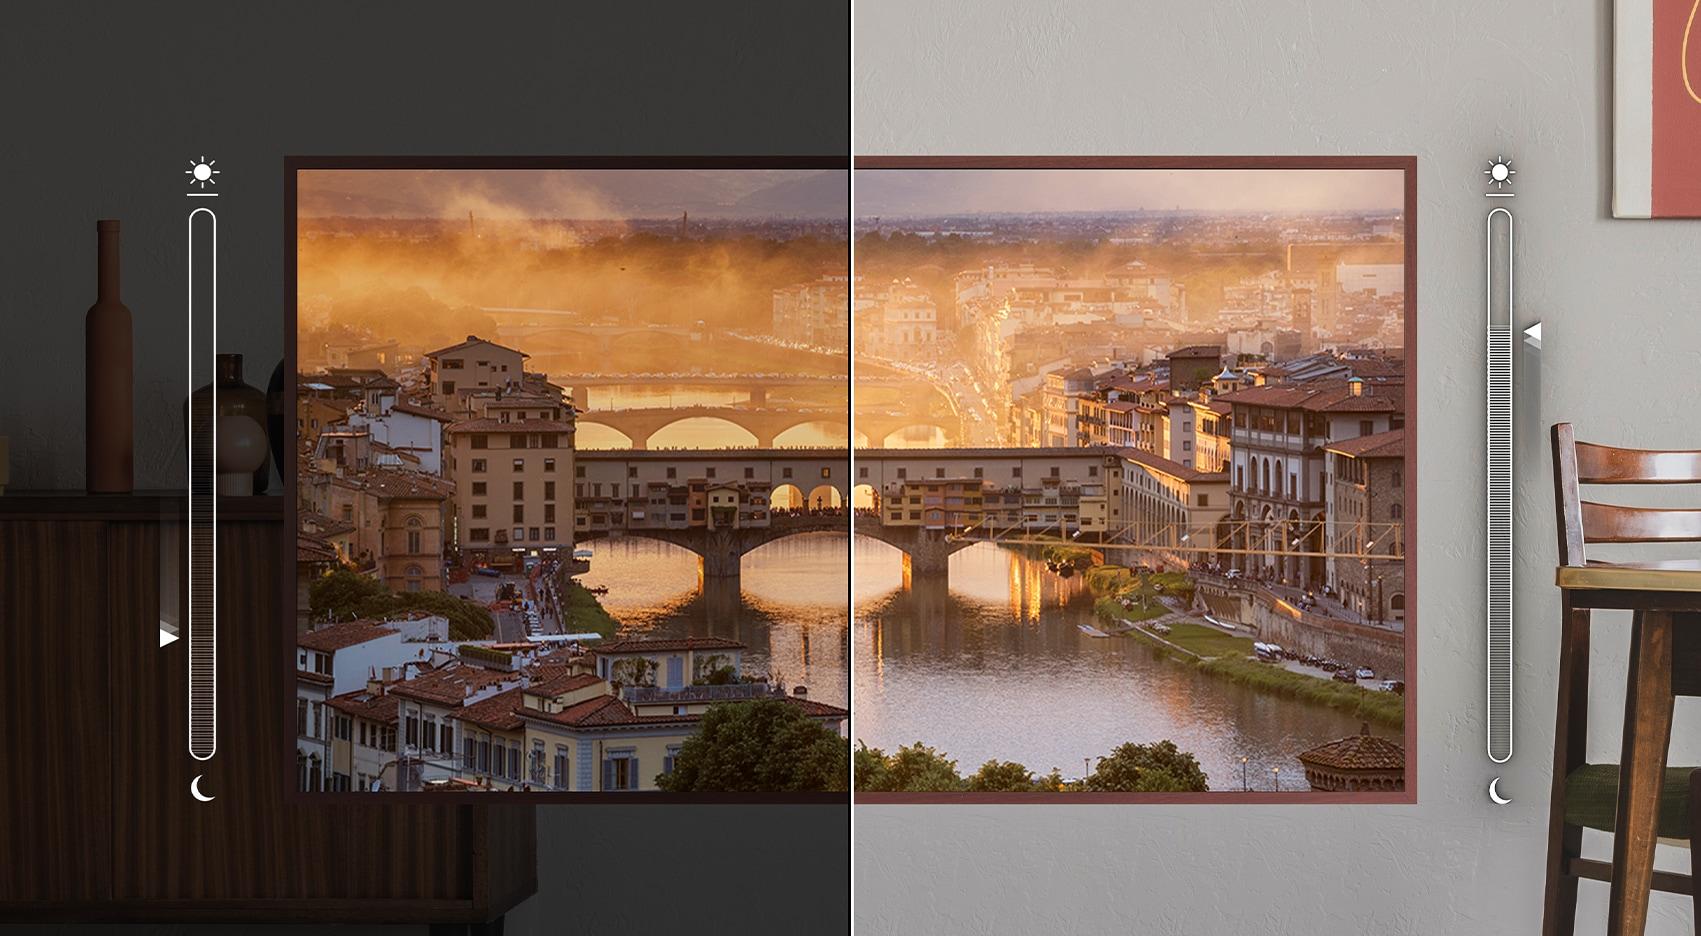 adaptive picture adapt